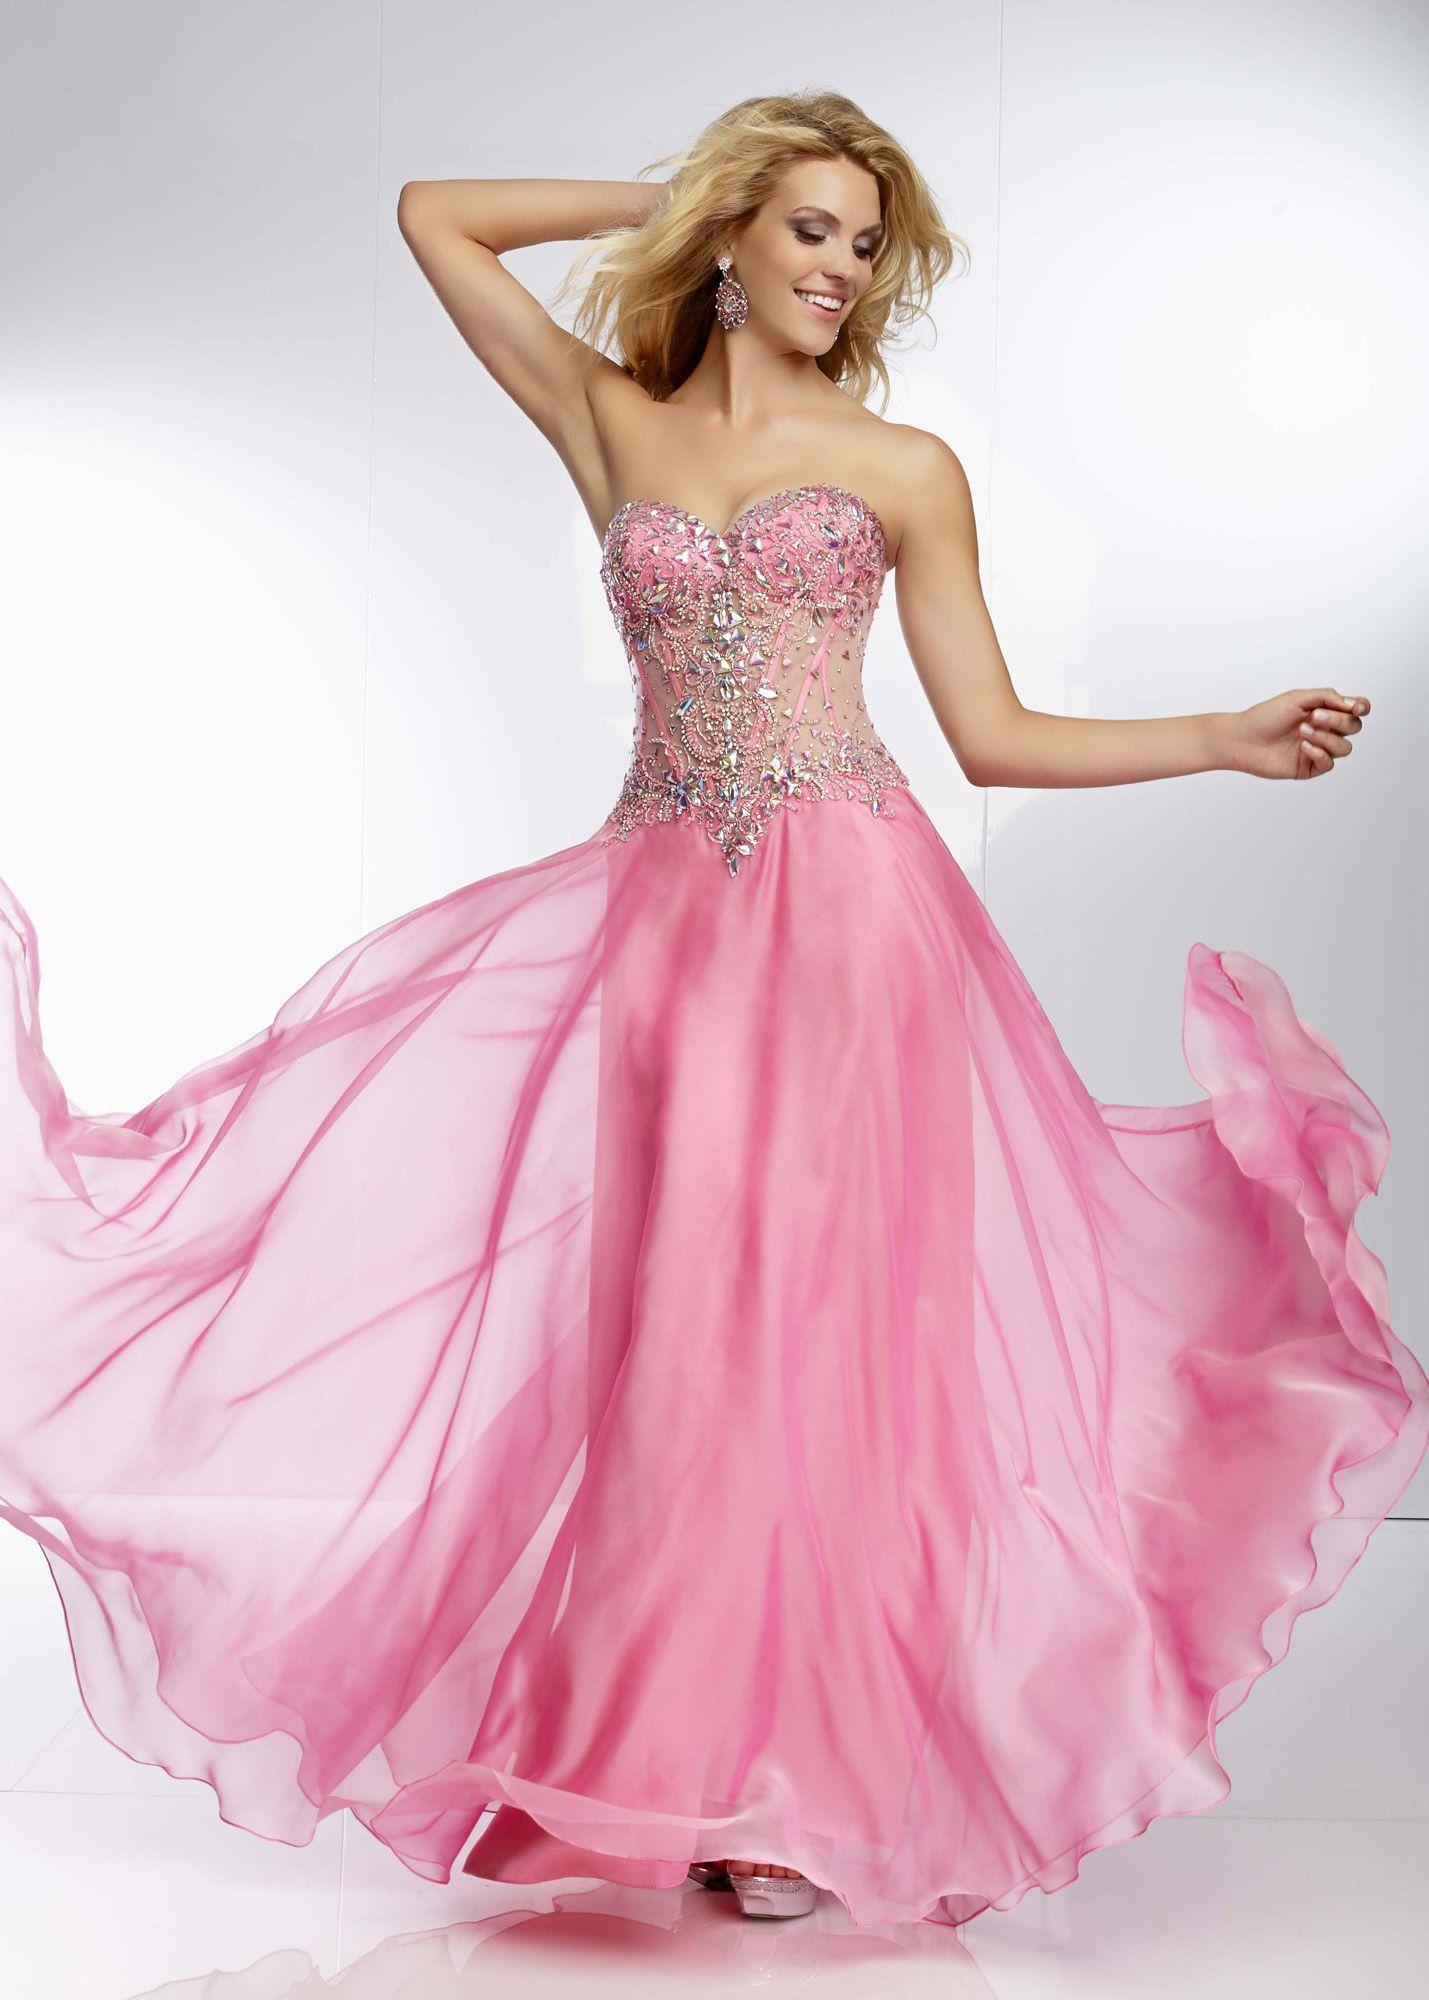 Mori Lee 95070 - Candy Pink Beaded Chiffon Prom Dresses Online #thepromdresses